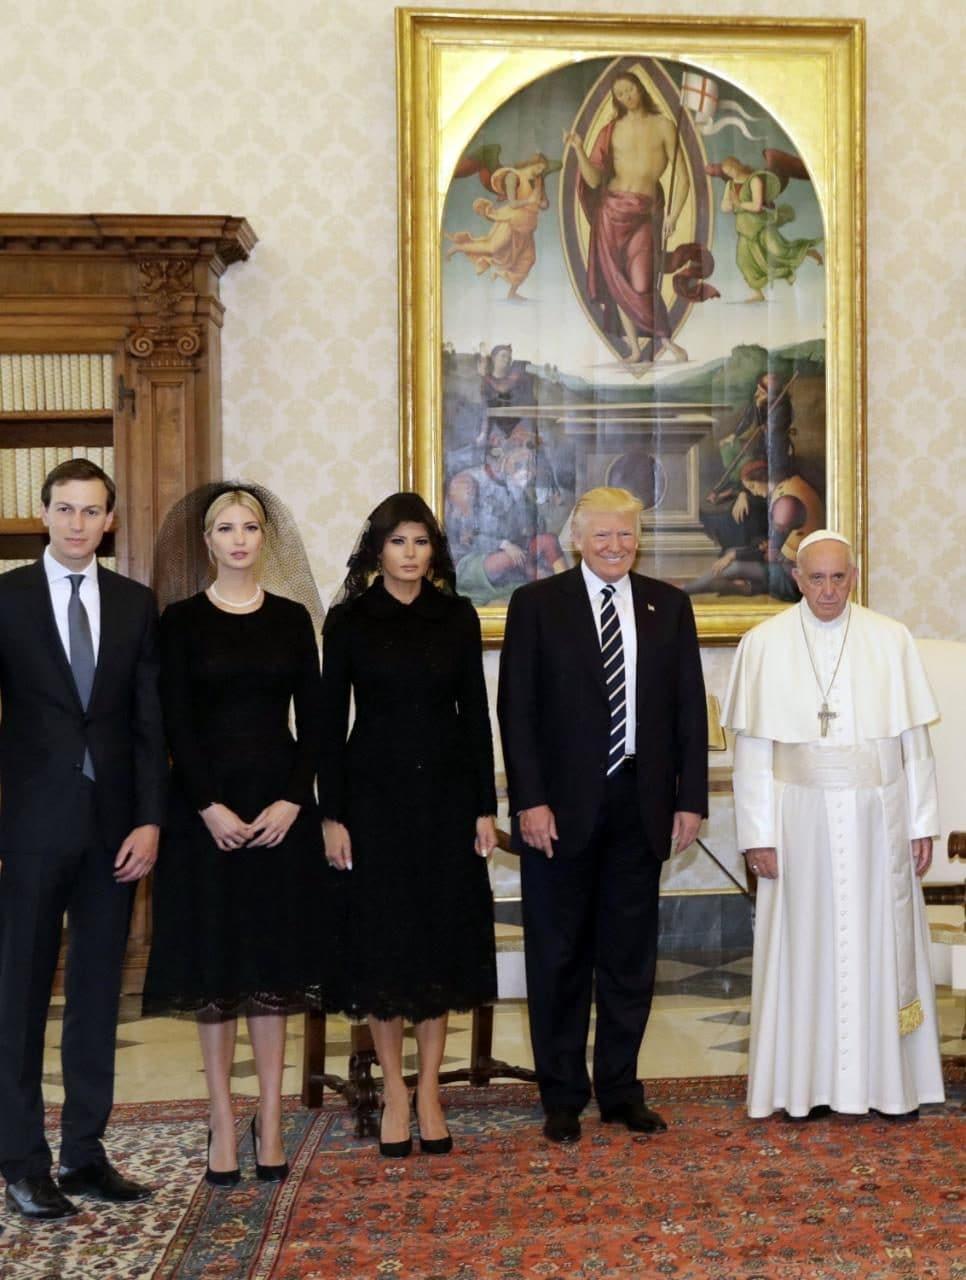 Jared Kushner, Ivanka Trump, First Lady Melania Trump and President Donald Trump with Pope Francis